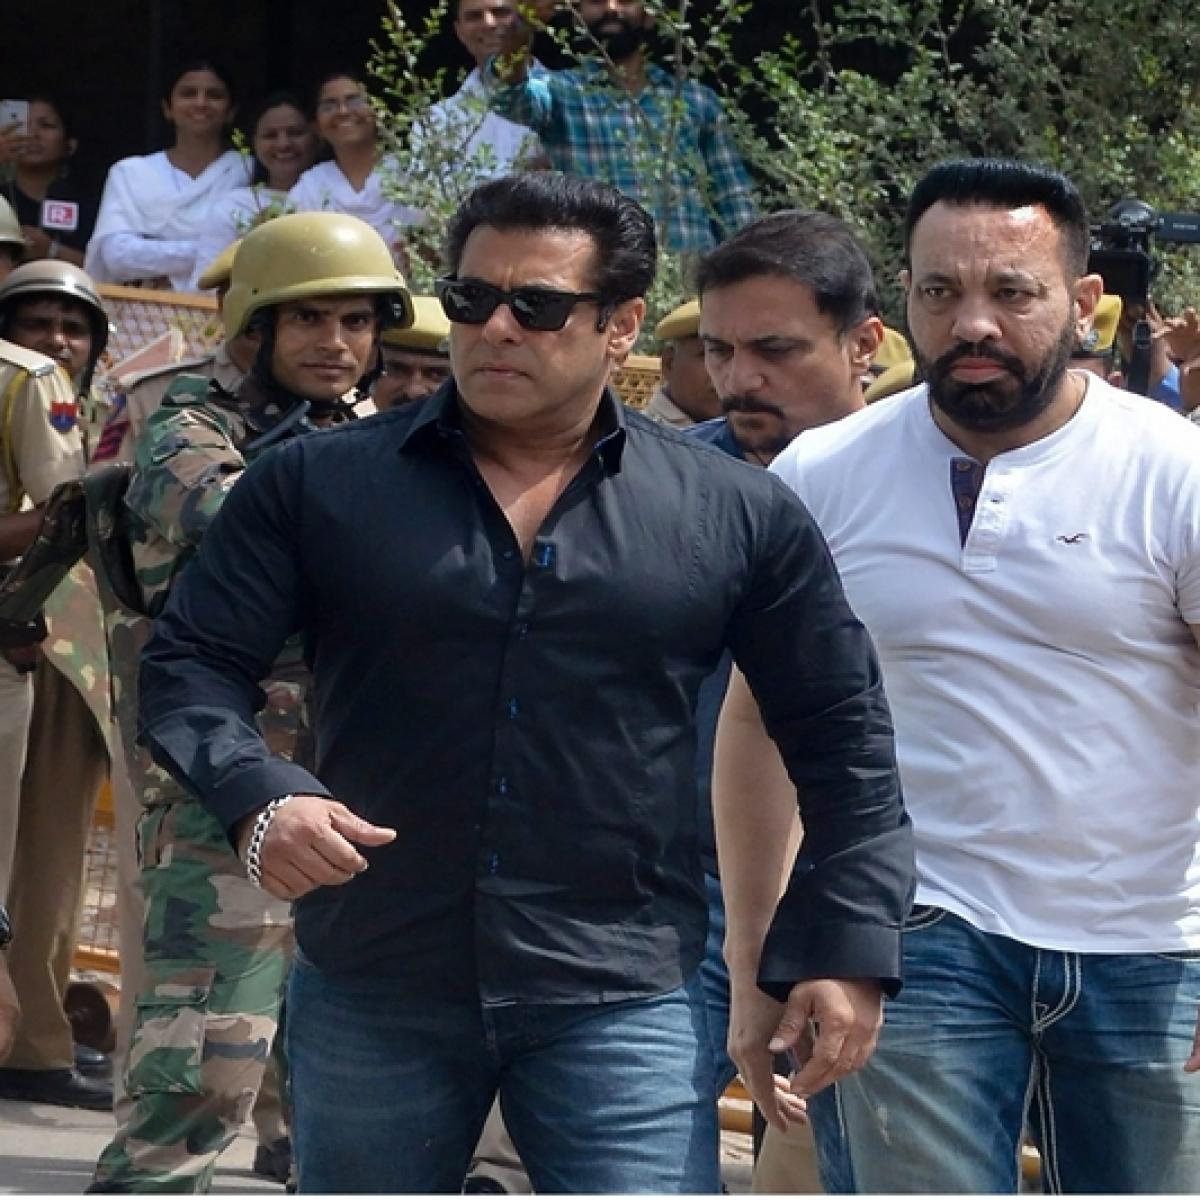 Blackbuck Poaching Case: Jodhpur court dismisses state govt's plea over Salman Khan's 'false affidavit'